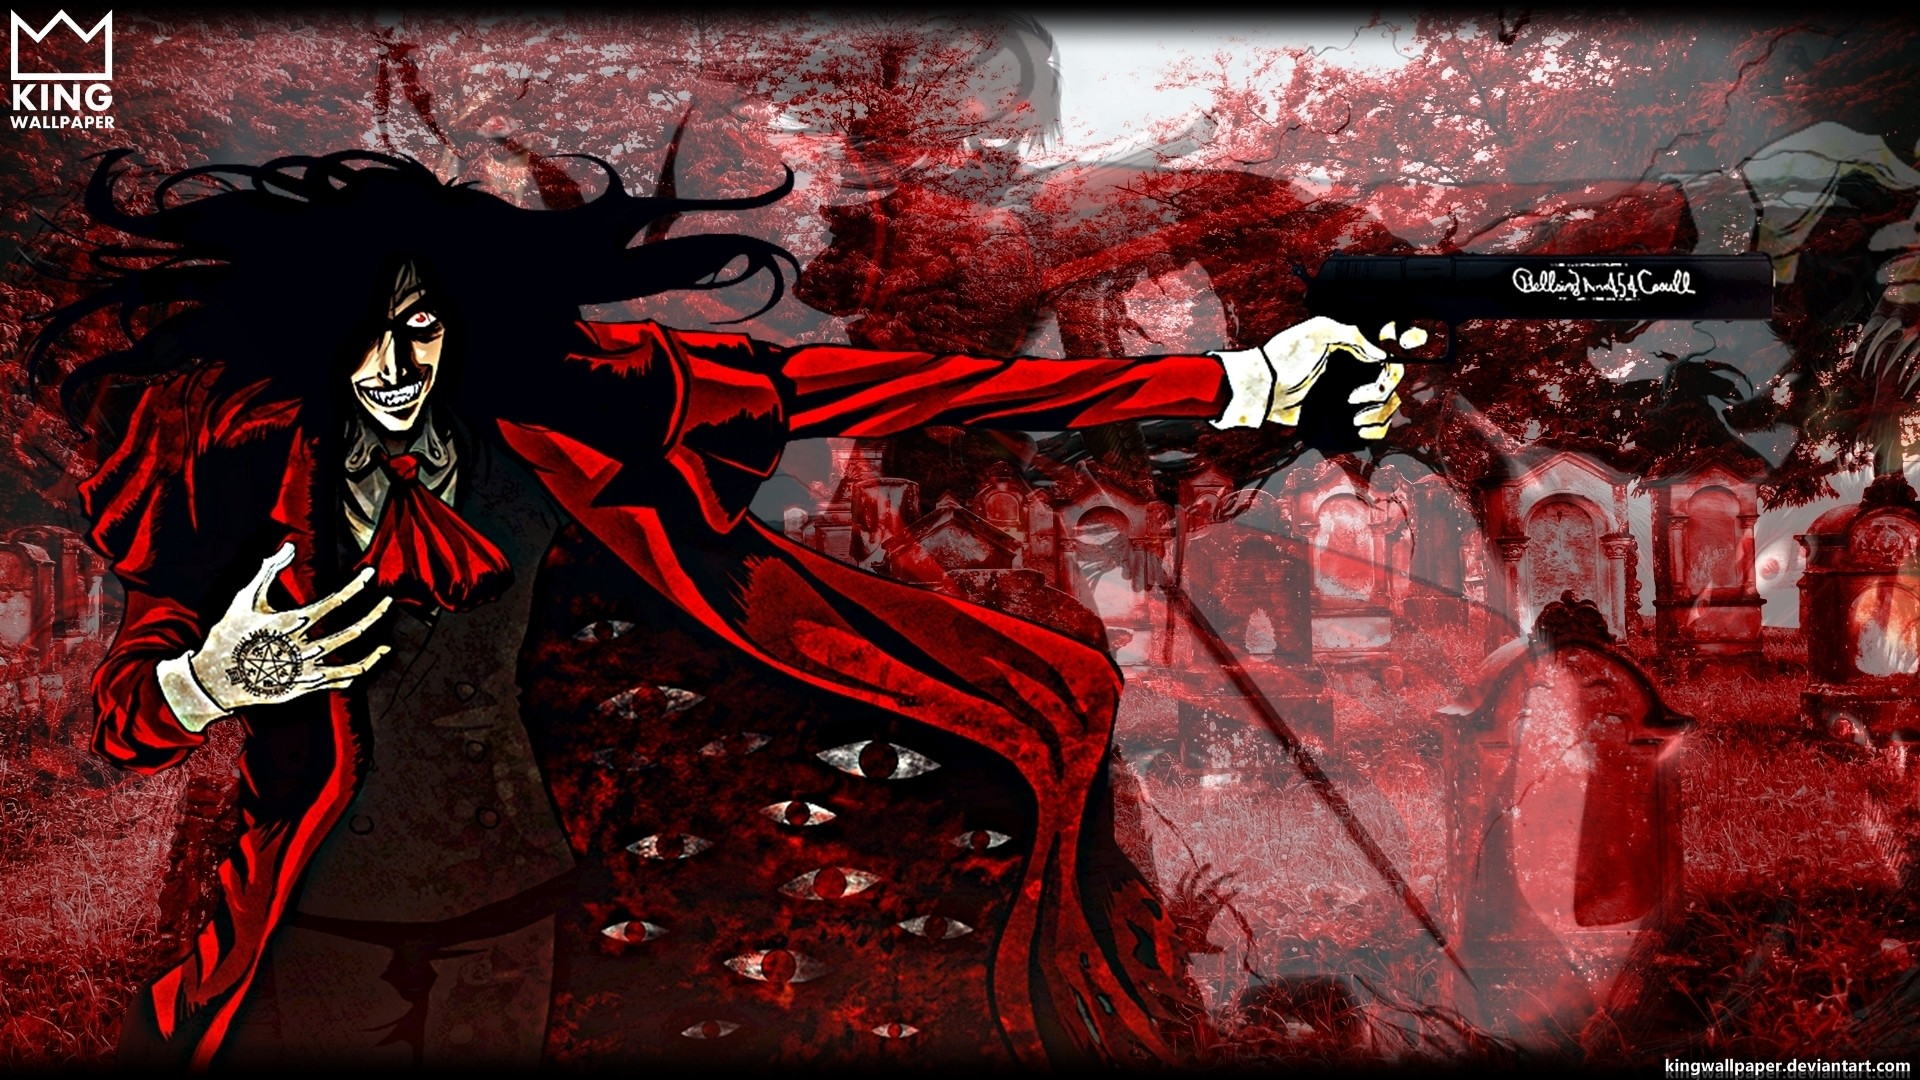 Res: 1920x1080, hellsing wallpaper iphone 6 - Preview wallpaper hellsing alucard art Anime  Pinterest